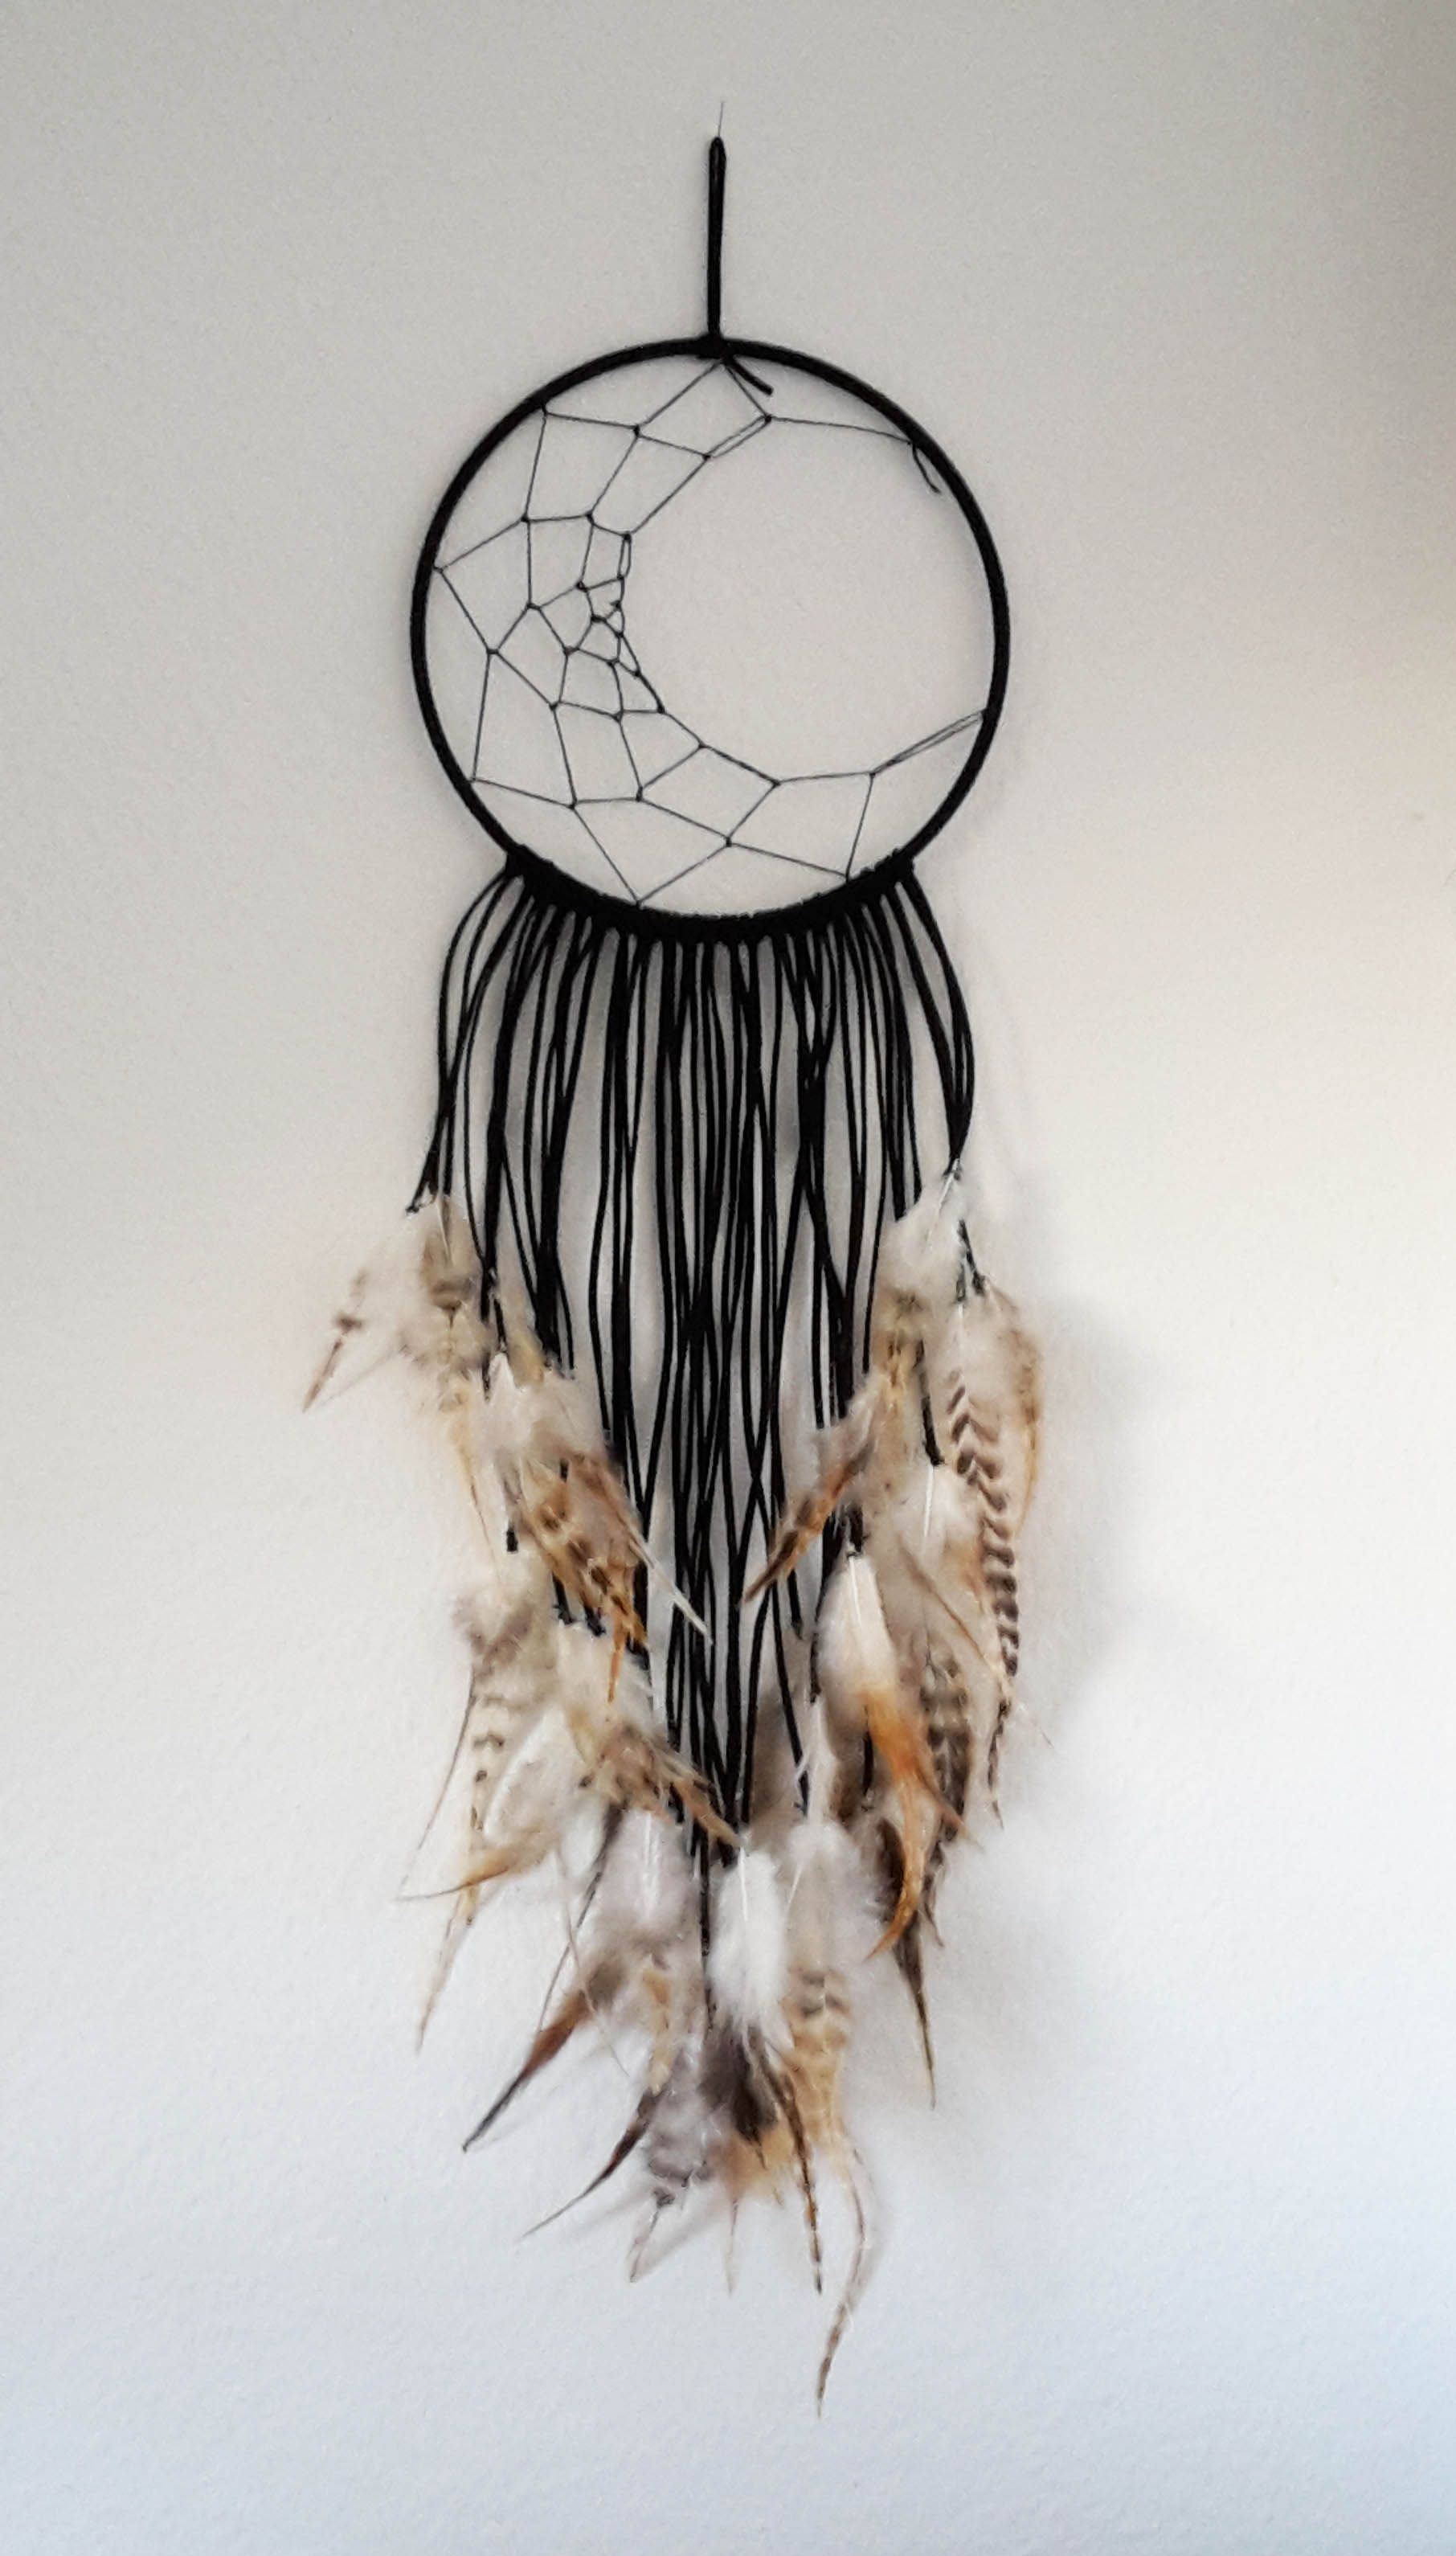 Dream Catcher Half Moon Black With Feathers Dream Catcher Craft